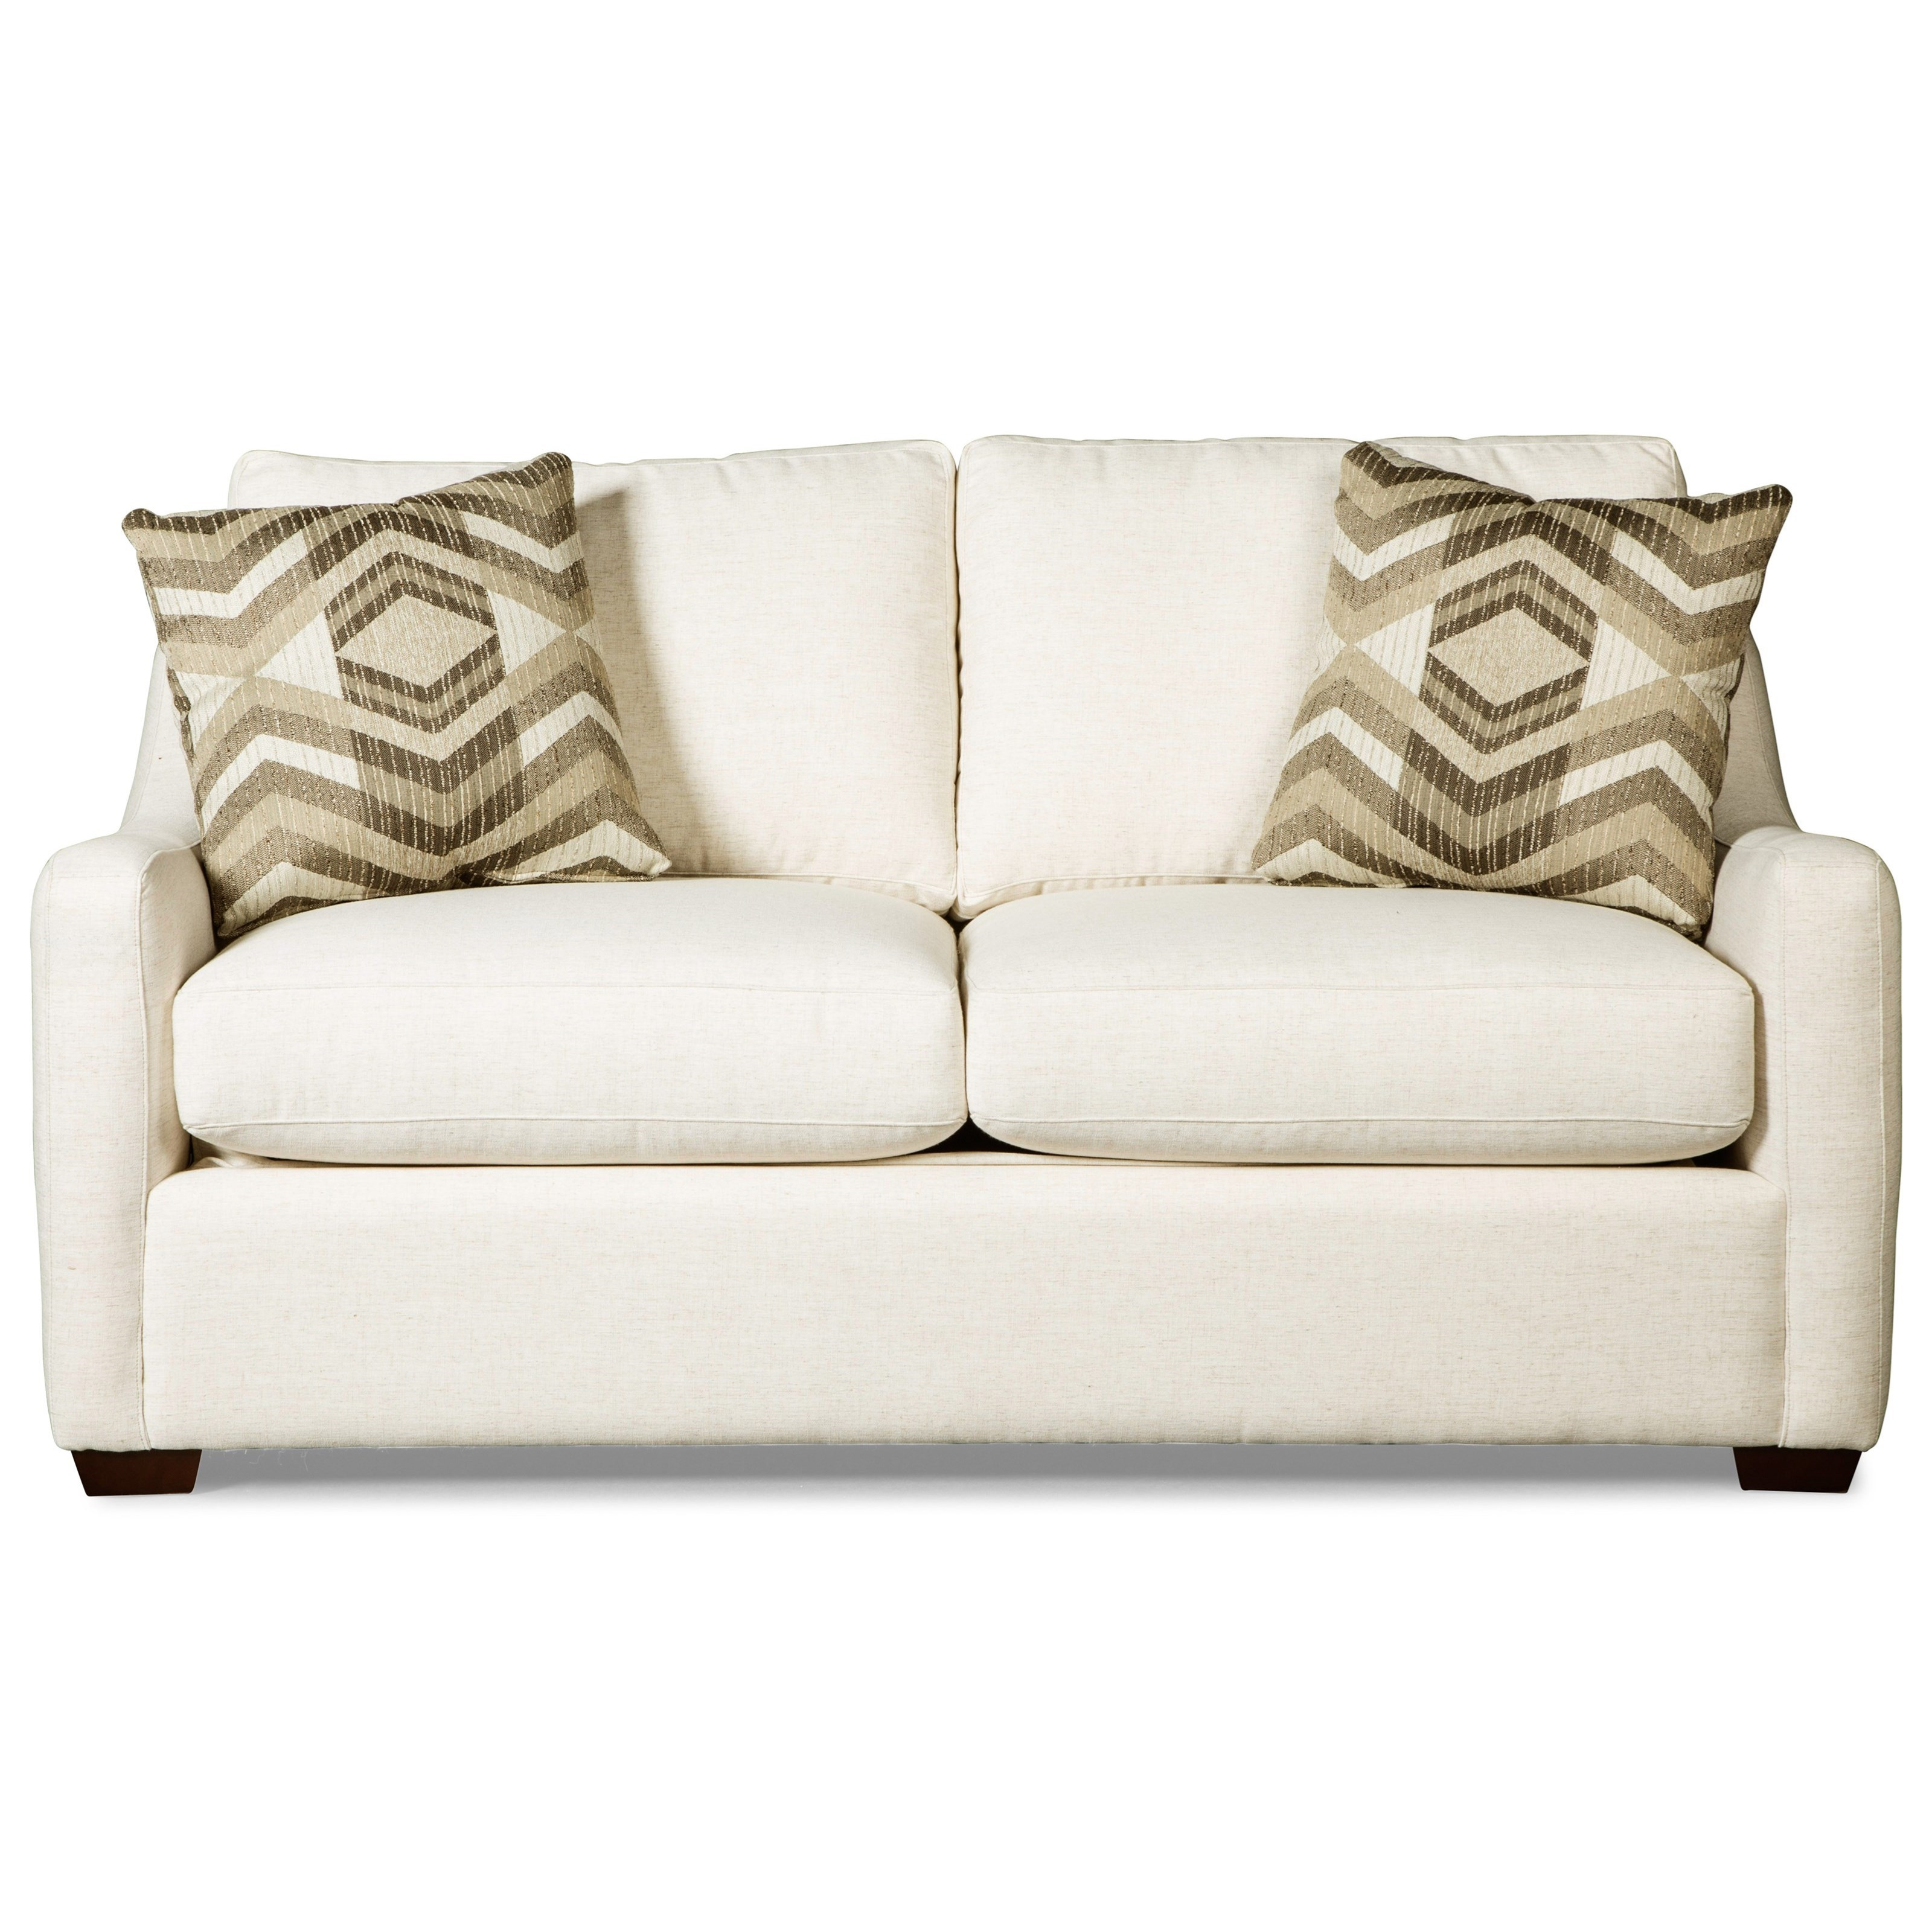 Craftmaster 7643 full size sleeper sofa w memoryfoam mattres item number 764350